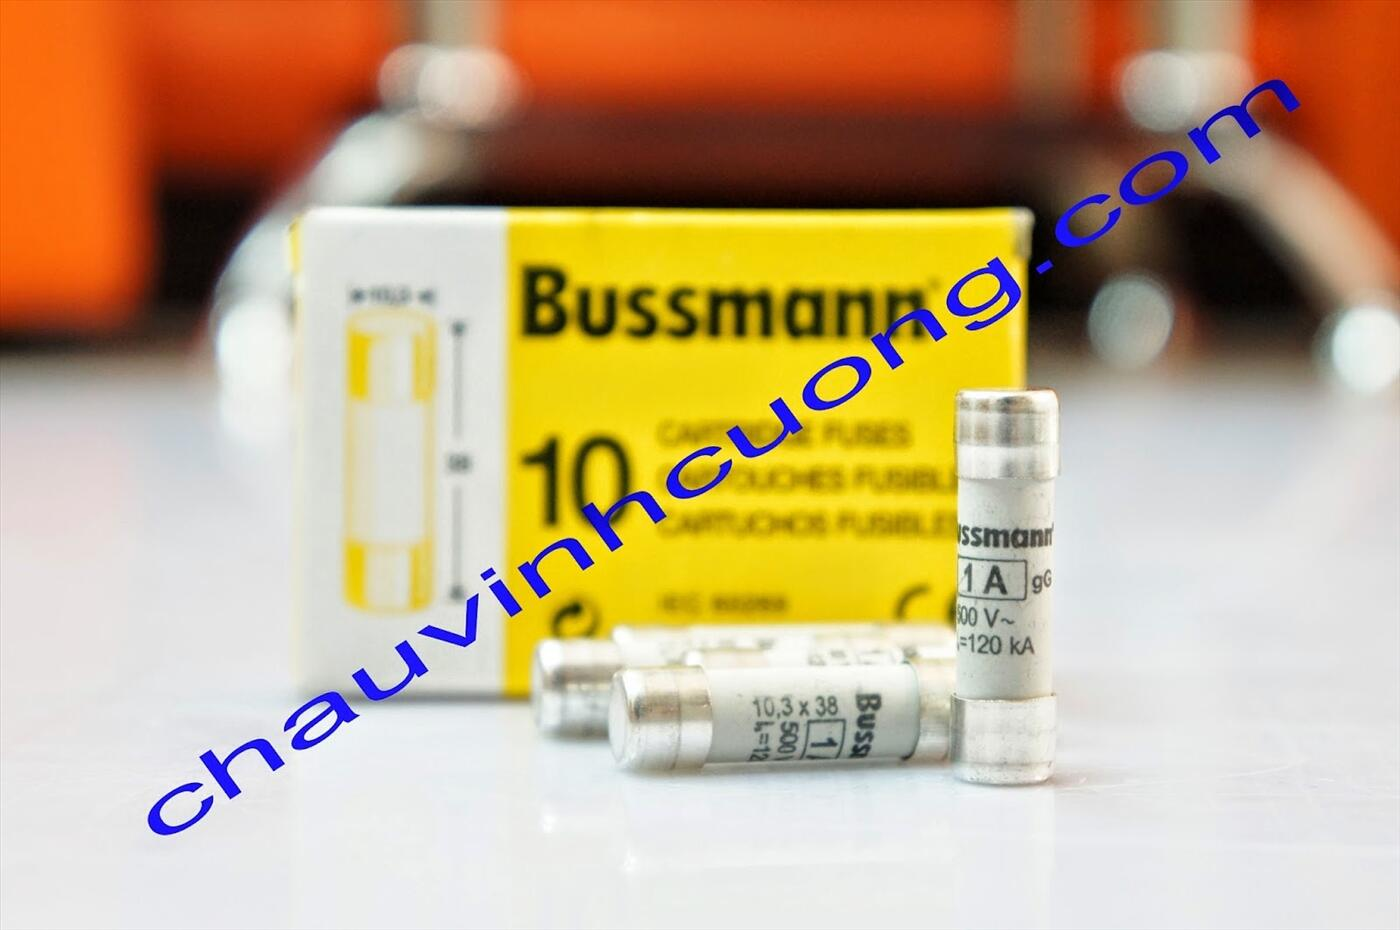 Cầu chì Bussmann C10G1